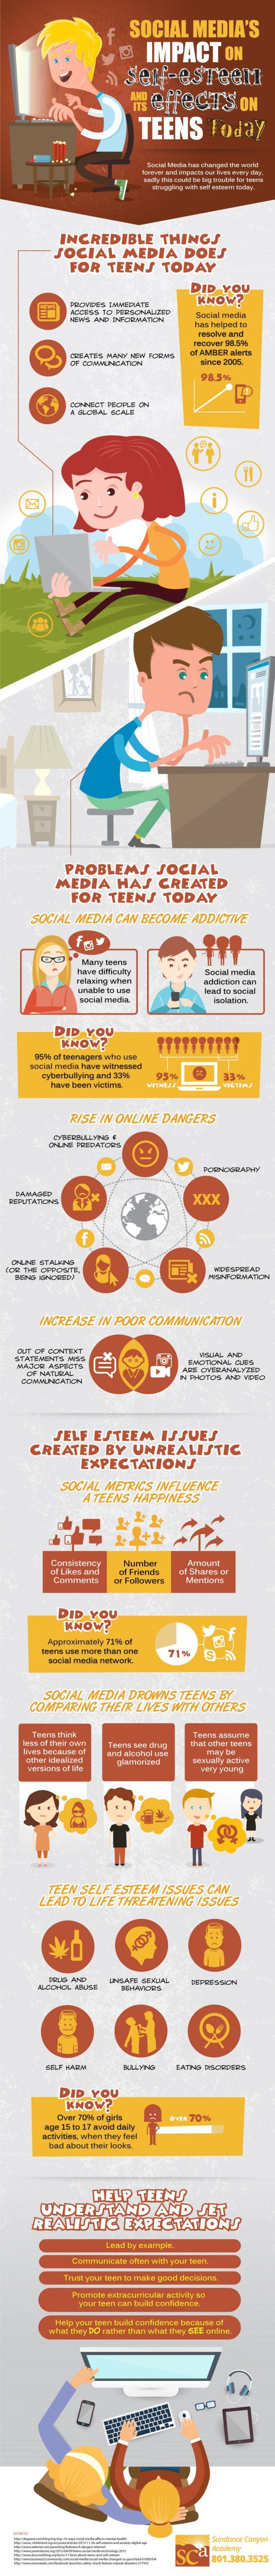 Social Media Impact on Self-Esteem Infographic